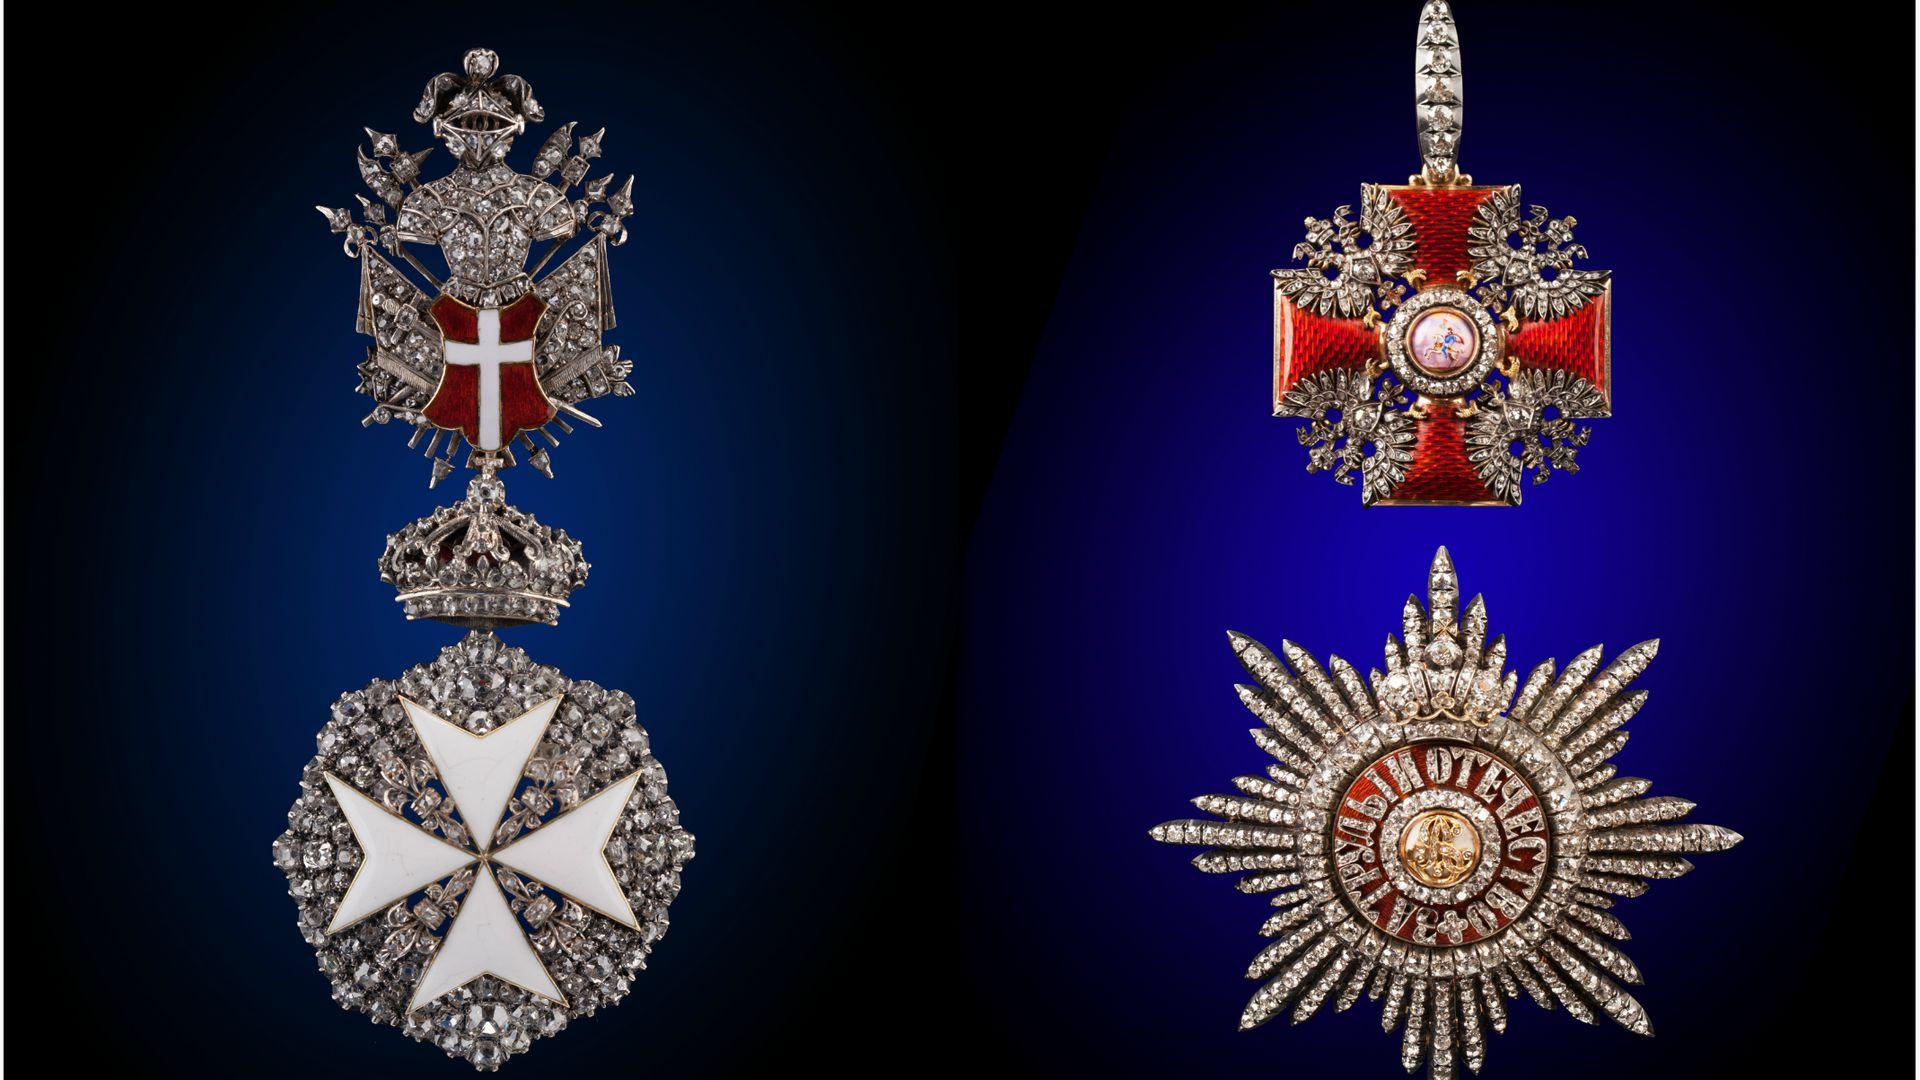 Tallinn Museum of Orders of Knighthood